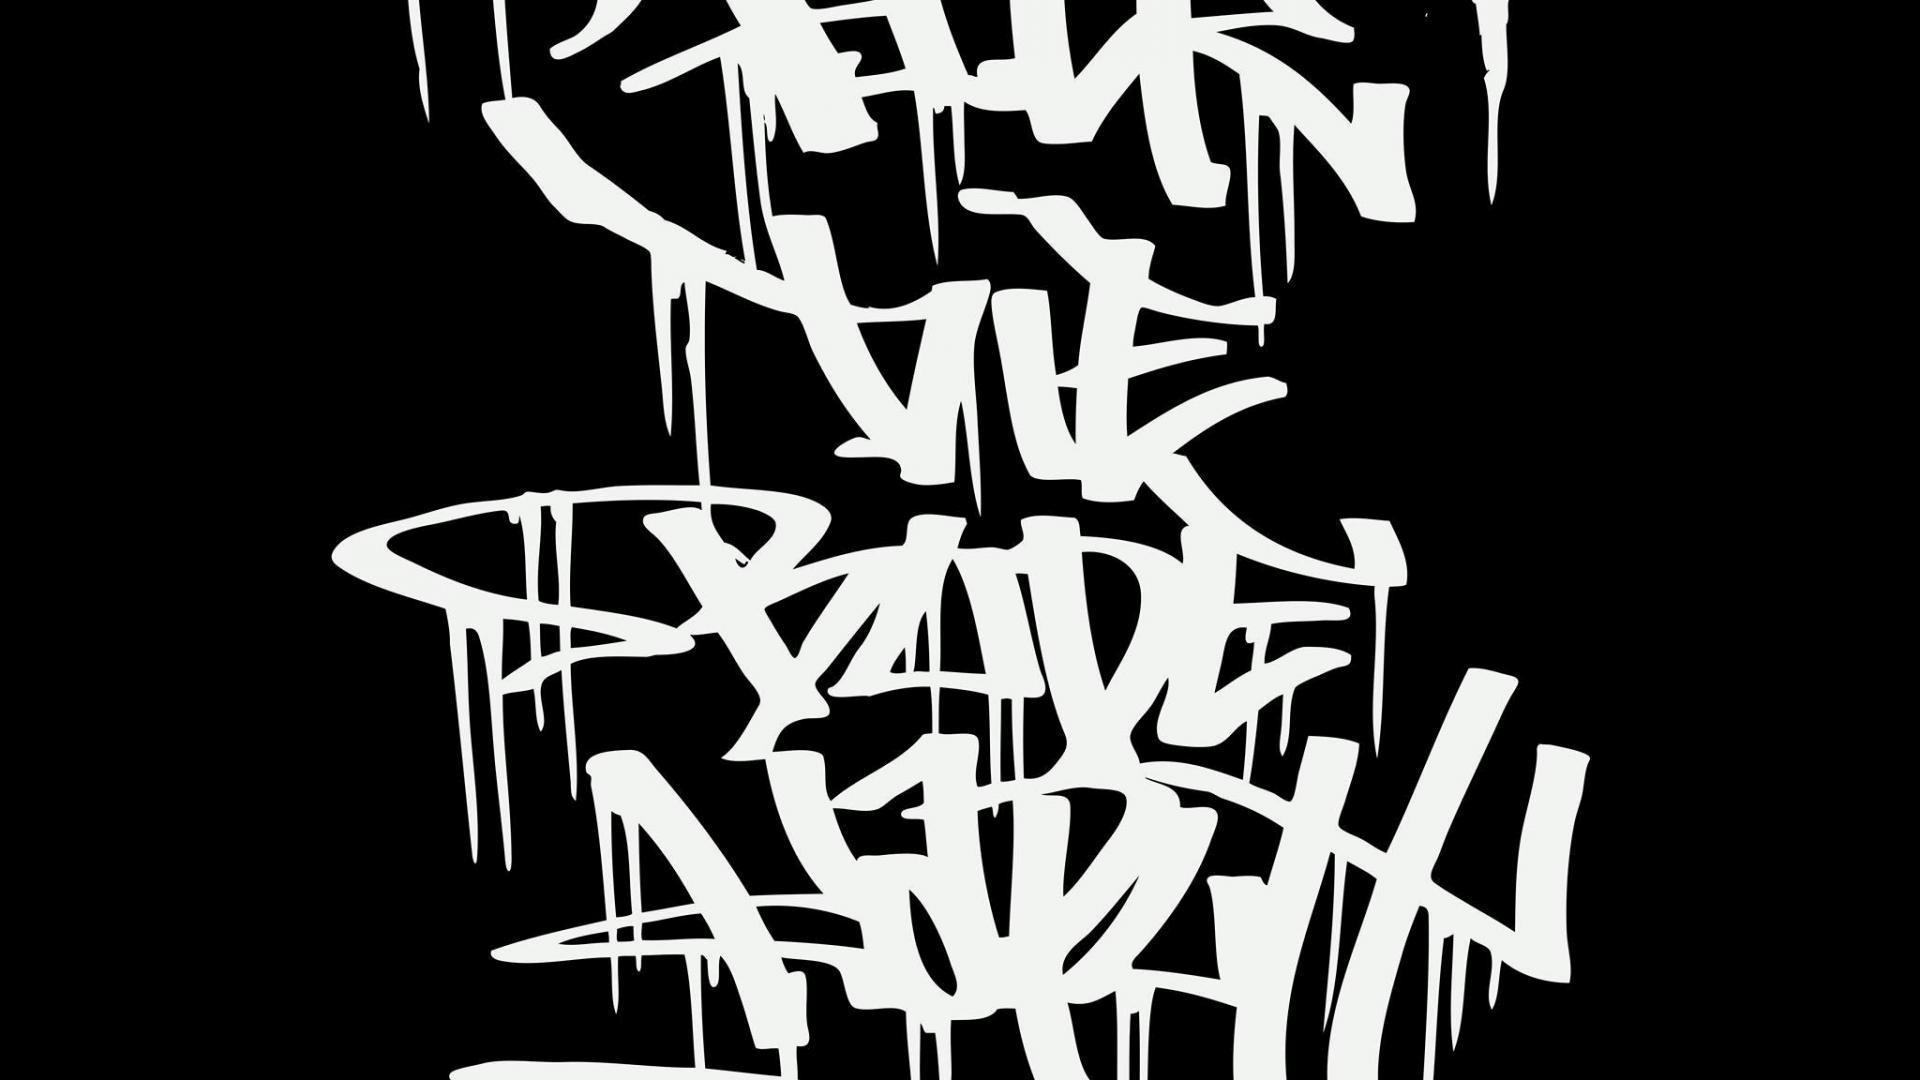 Hd Graffiti Wallpapers 1080p 63 Images